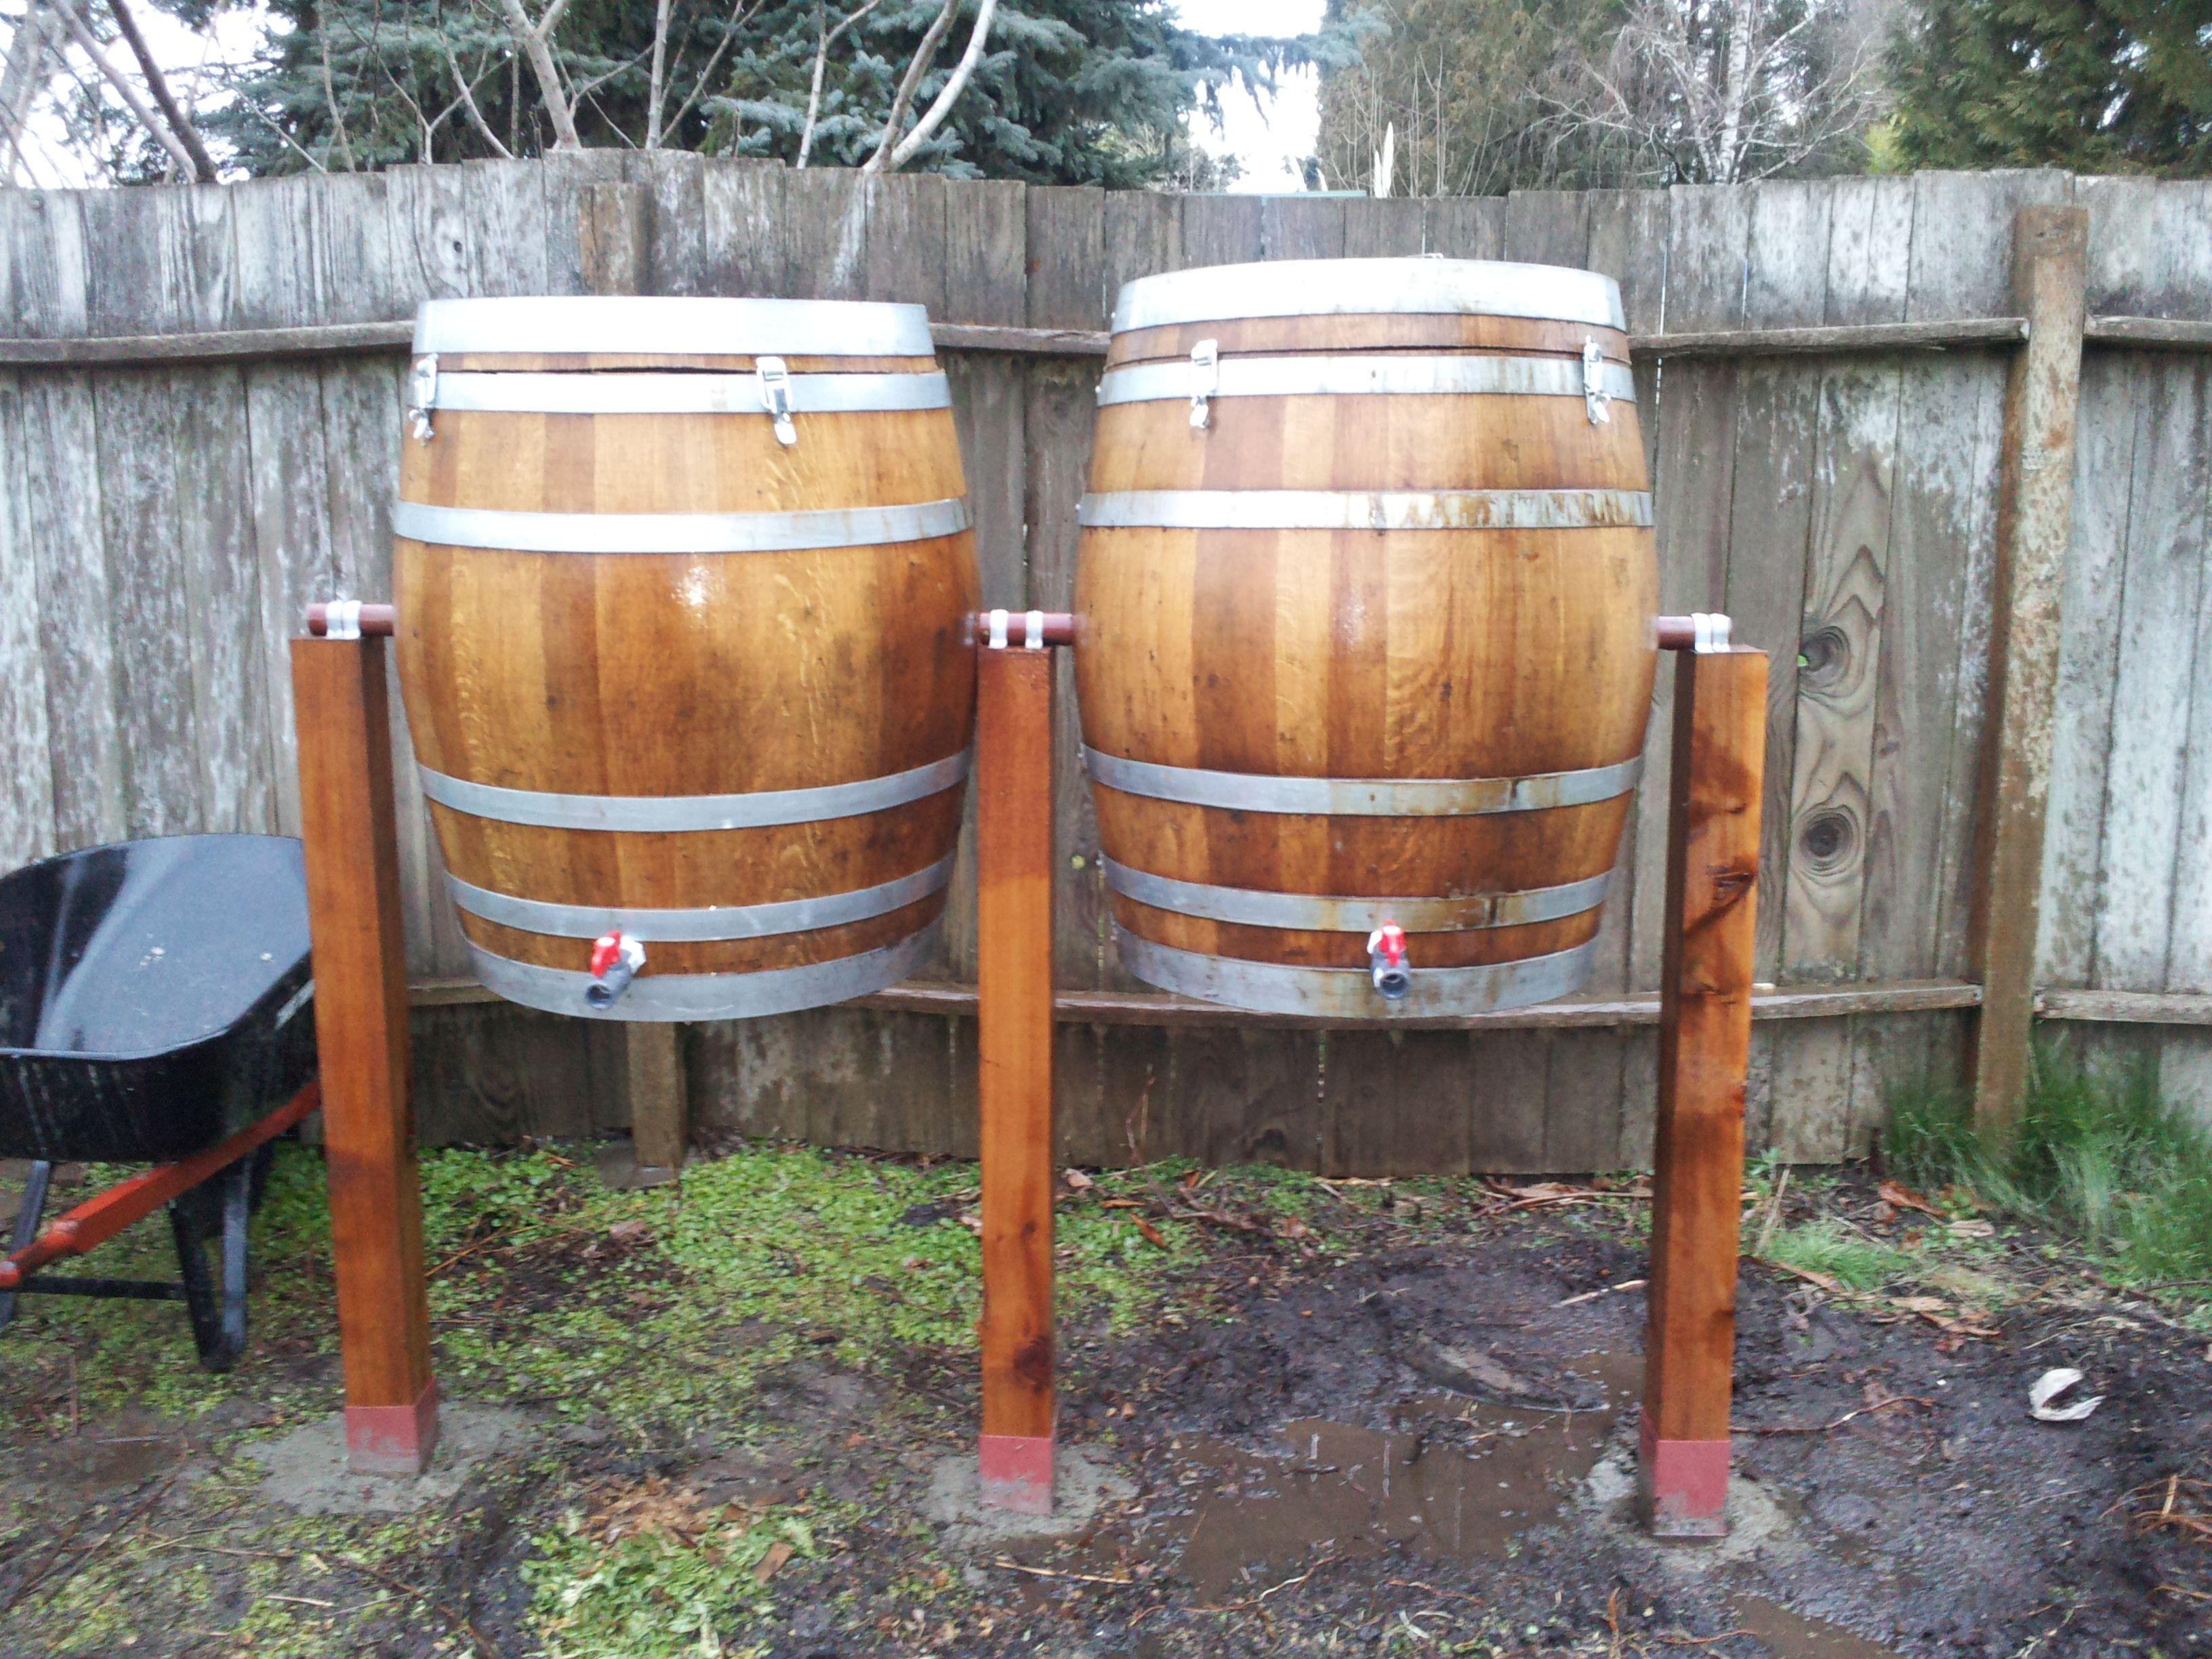 oak wine barrel composters we built for our garden wine barrel